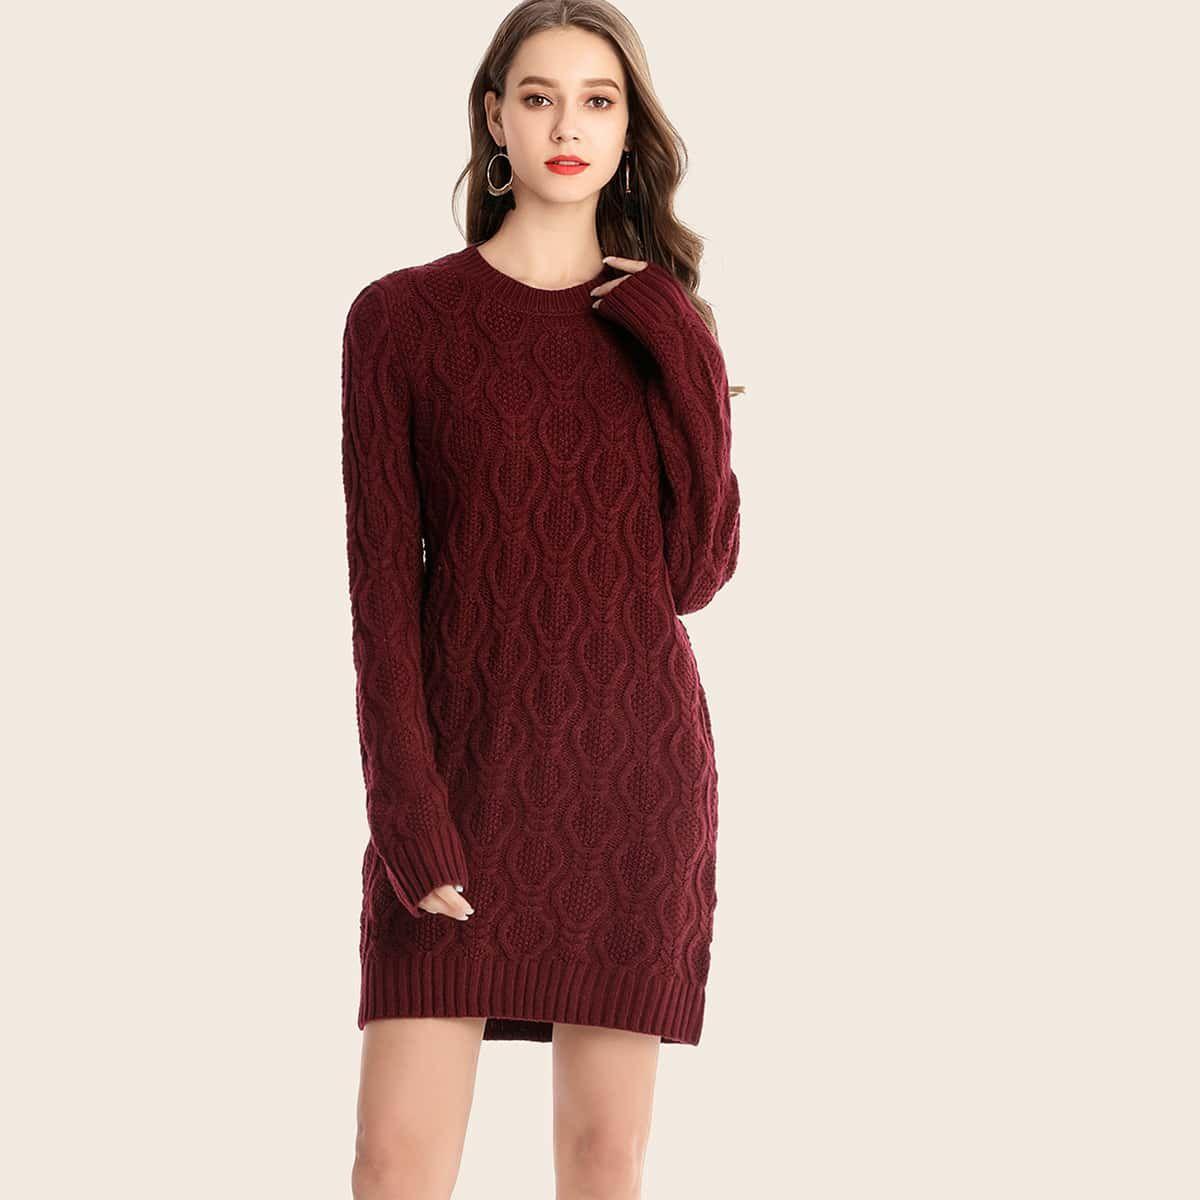 Cable Knit Fitted Sweater Dress Sweater Dress Crochet Dress Girl Summer Dress Patterns [ 1200 x 1200 Pixel ]